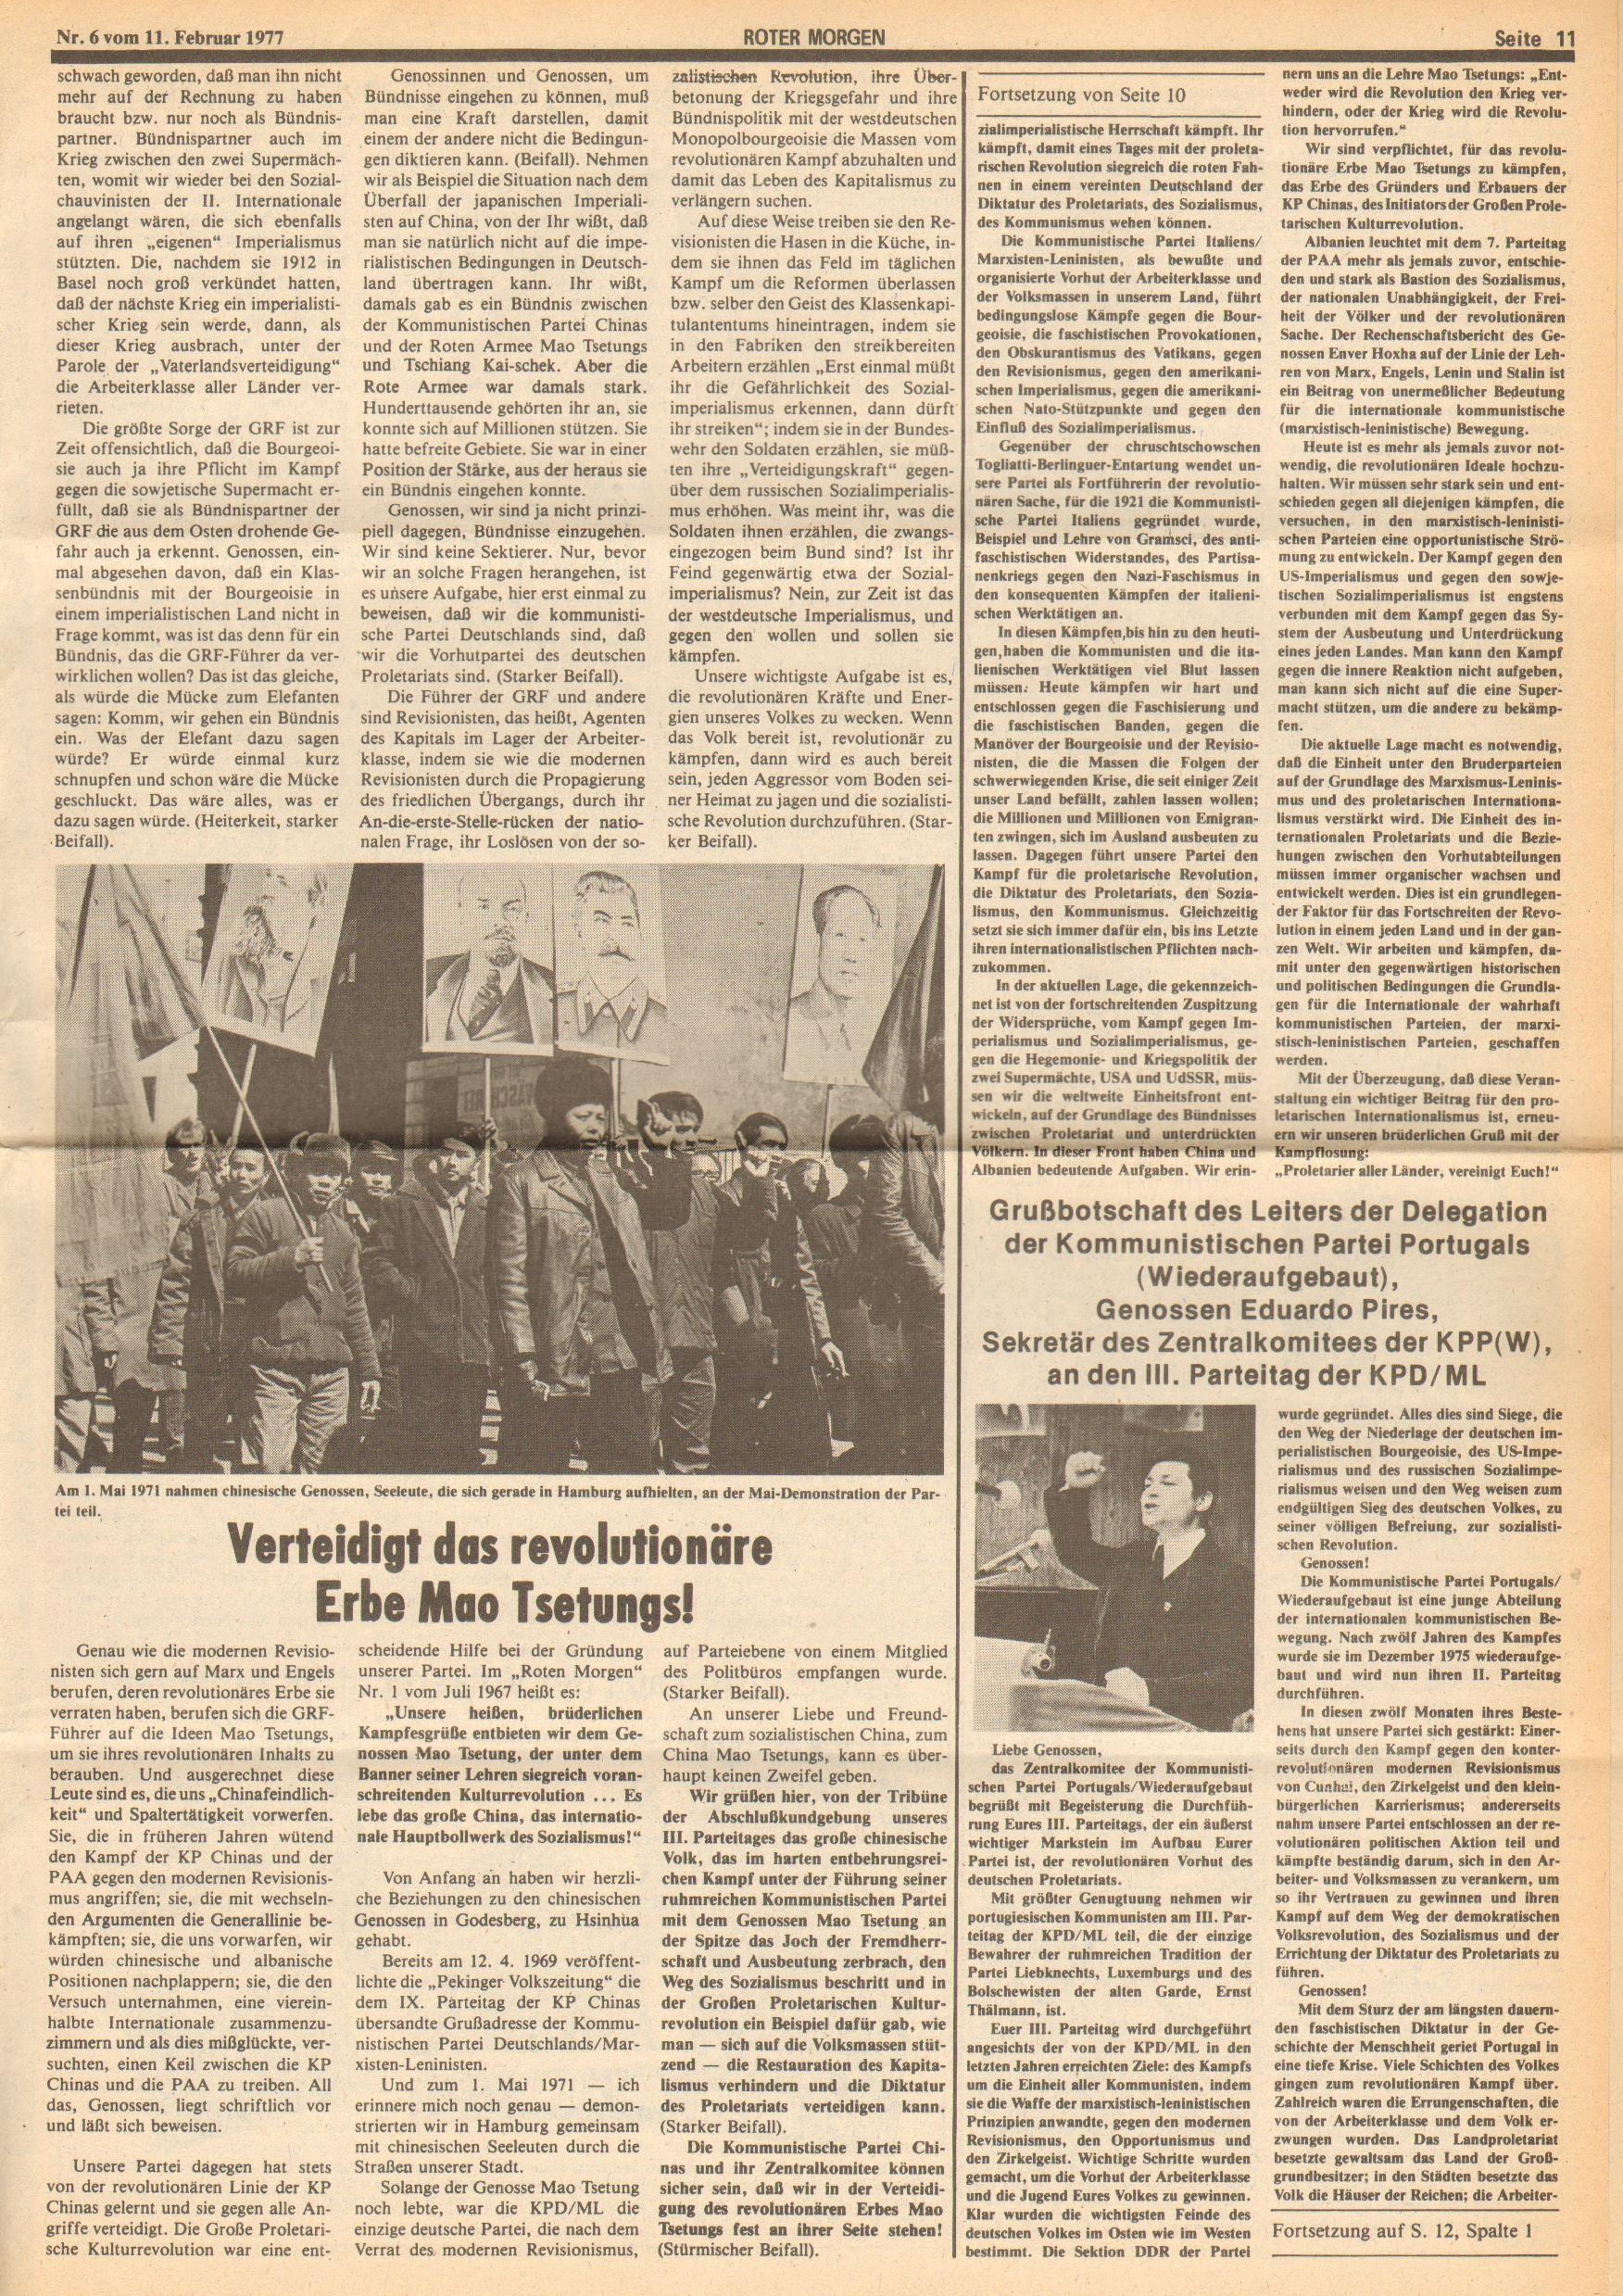 Roter Morgen, 11. Jg., 11. Februar 1977, Nr. 6, Seite 11